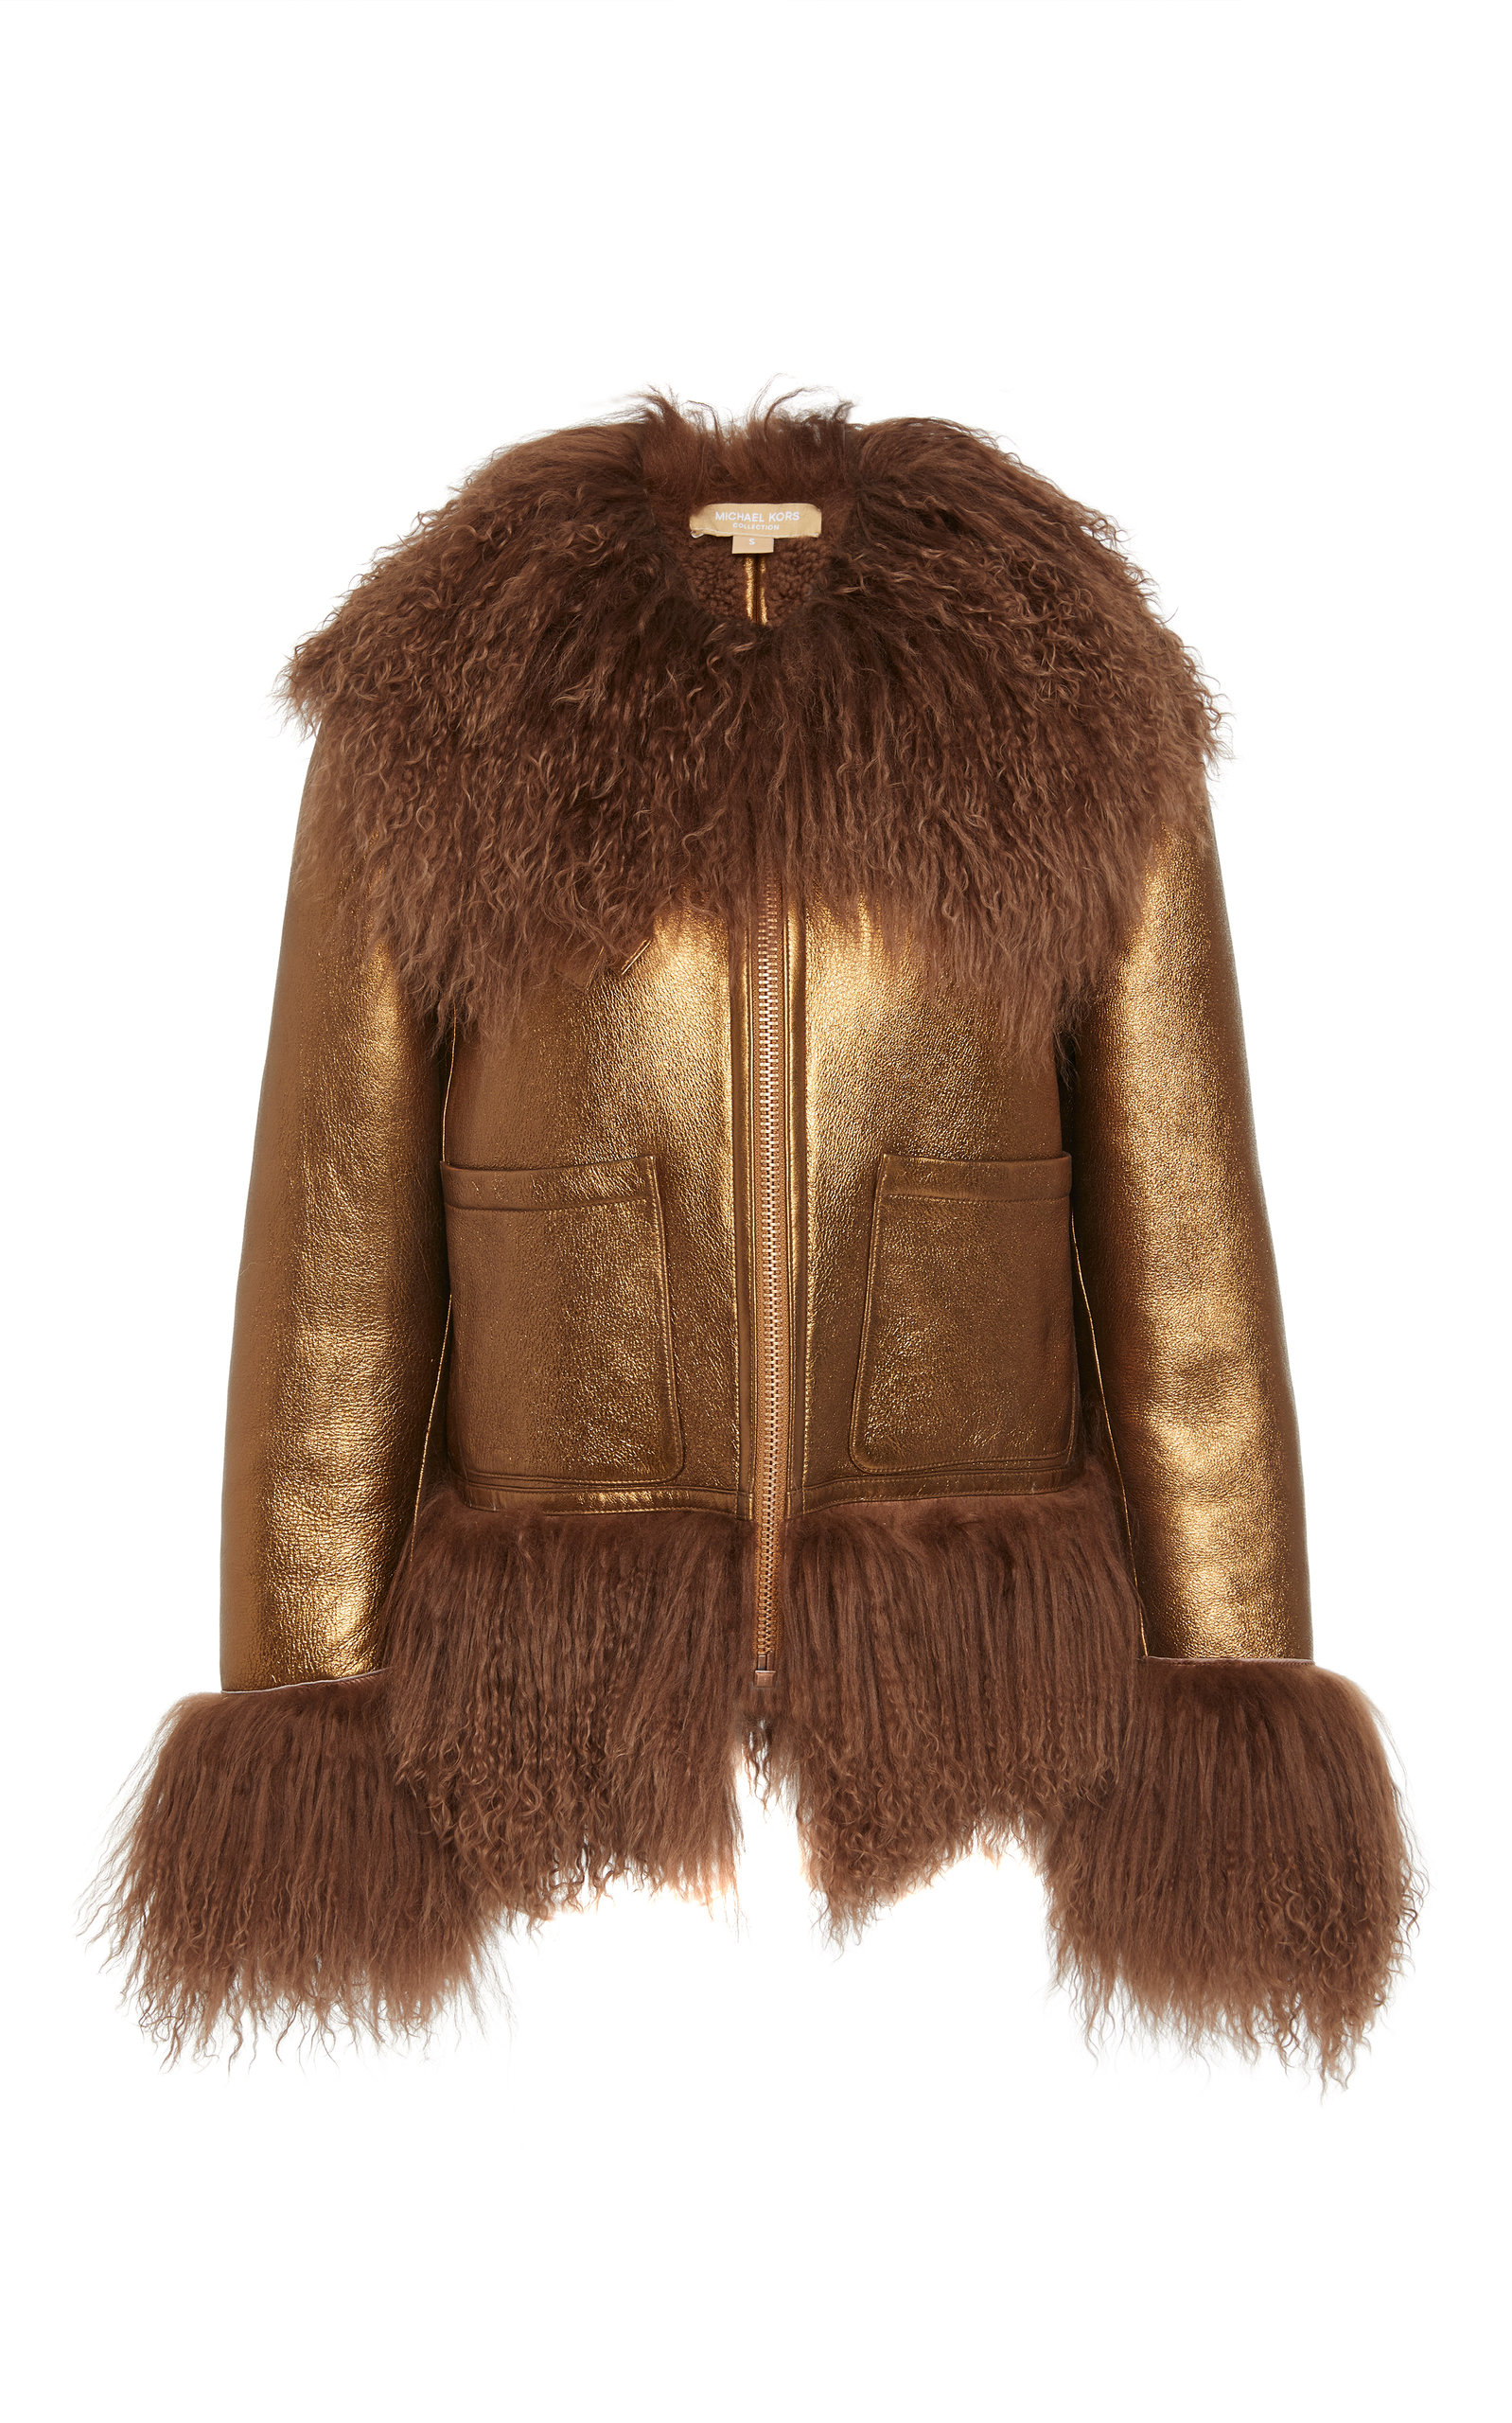 MICHAEL KORS | Michael Kors Collection Metallic Shearling Leather Bomber Jacket | Goxip